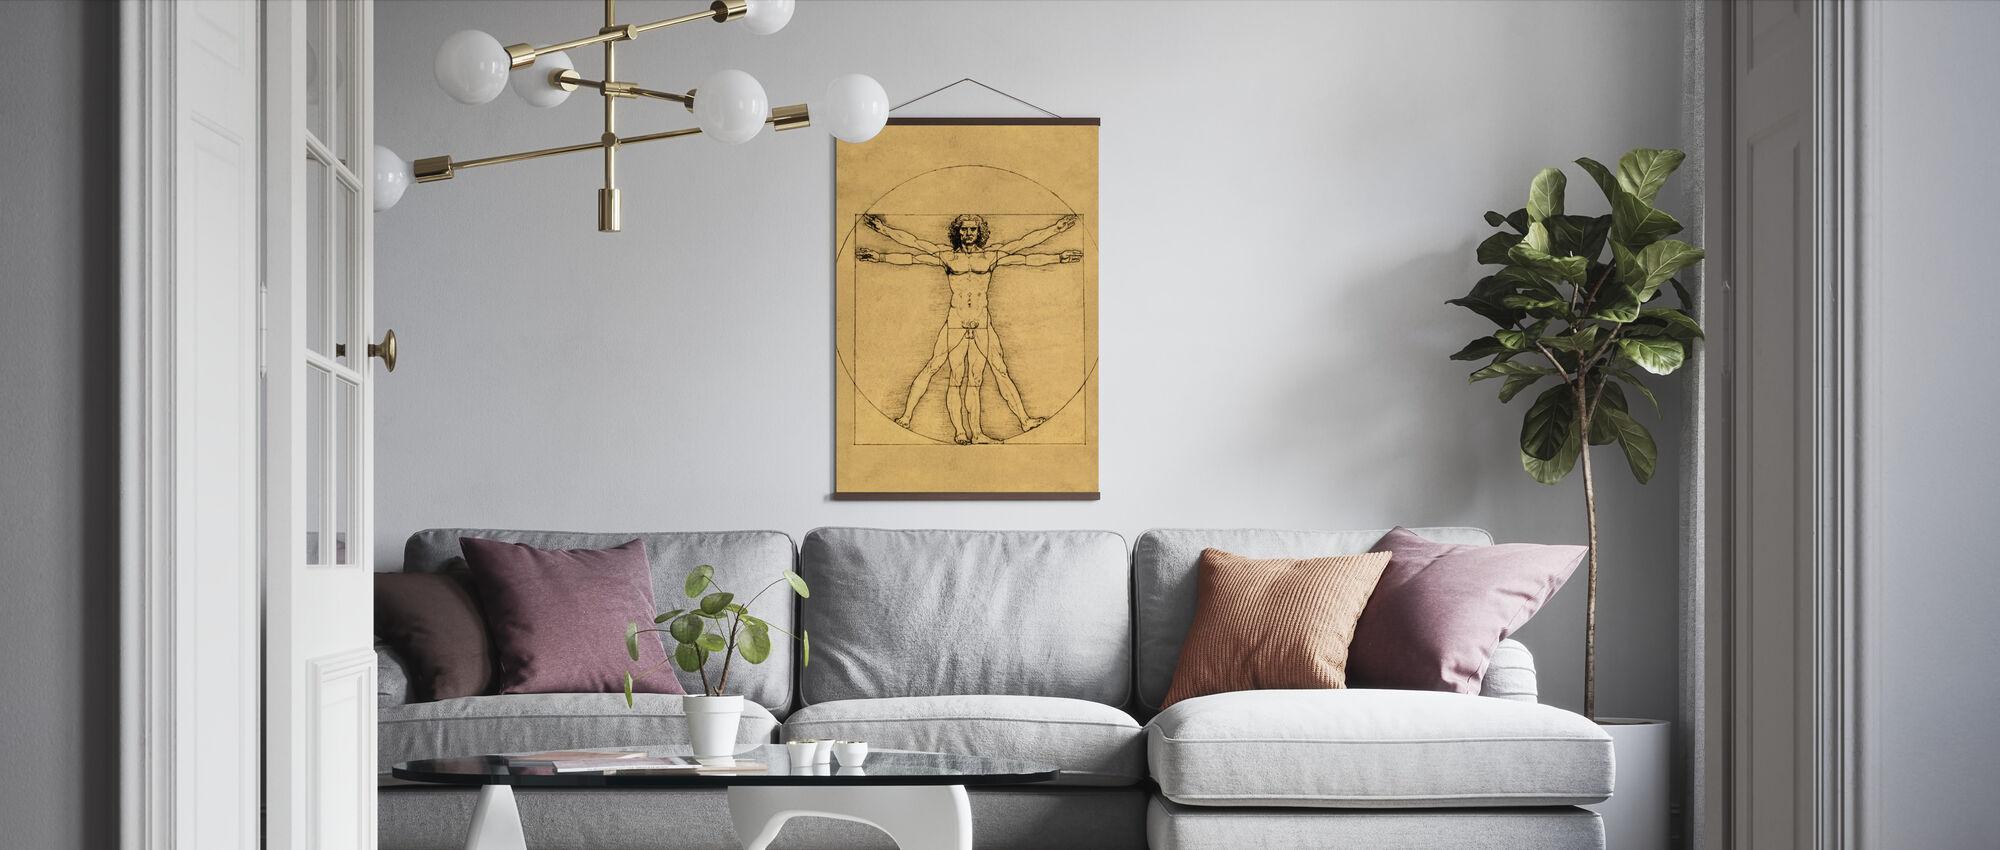 Mänsklig gestalt - Leonardo da Vinci - Poster - Vardagsrum